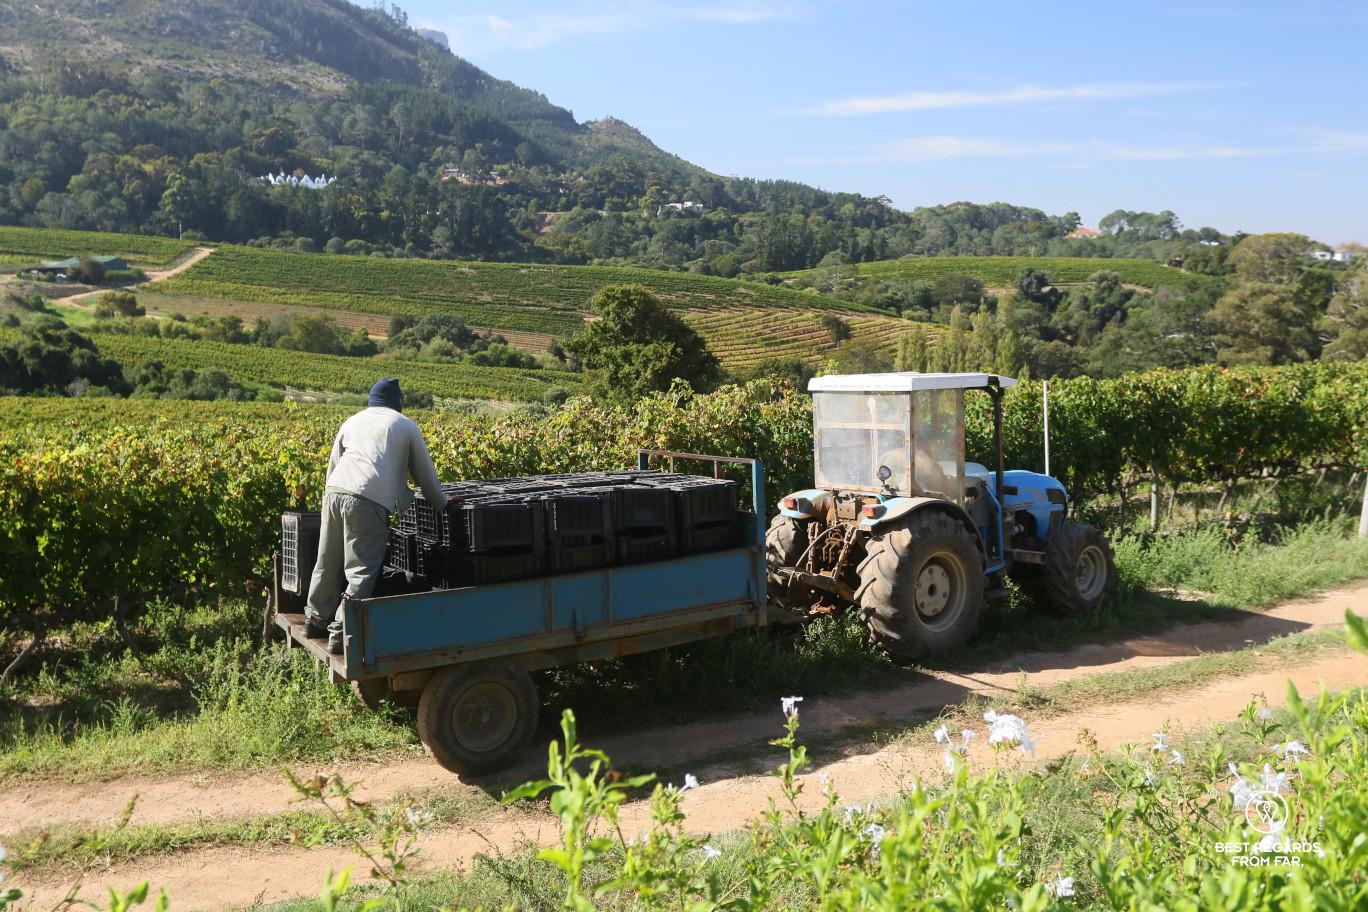 Glen Constantia vineyard with farm workers harvesting, Constantia wine route, Cape Town